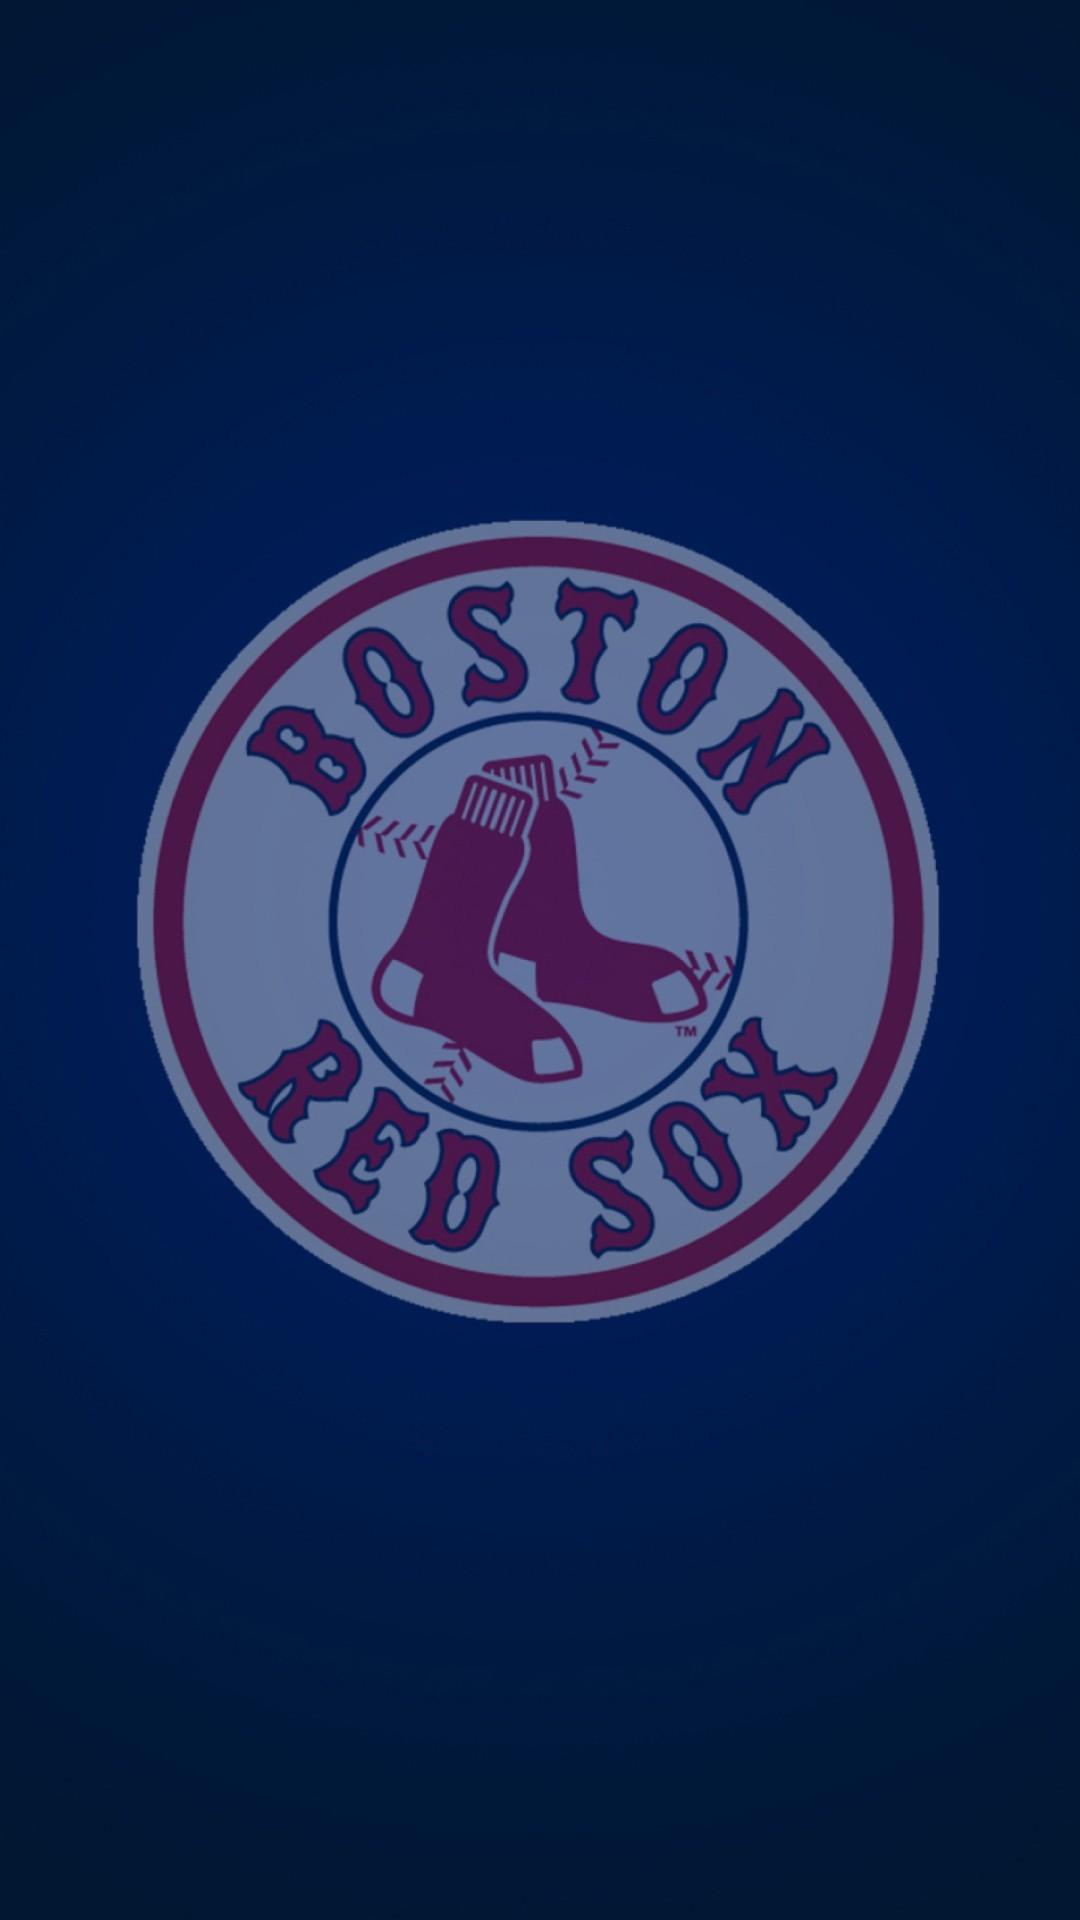 Boston Red Sox Logo Wallpaper